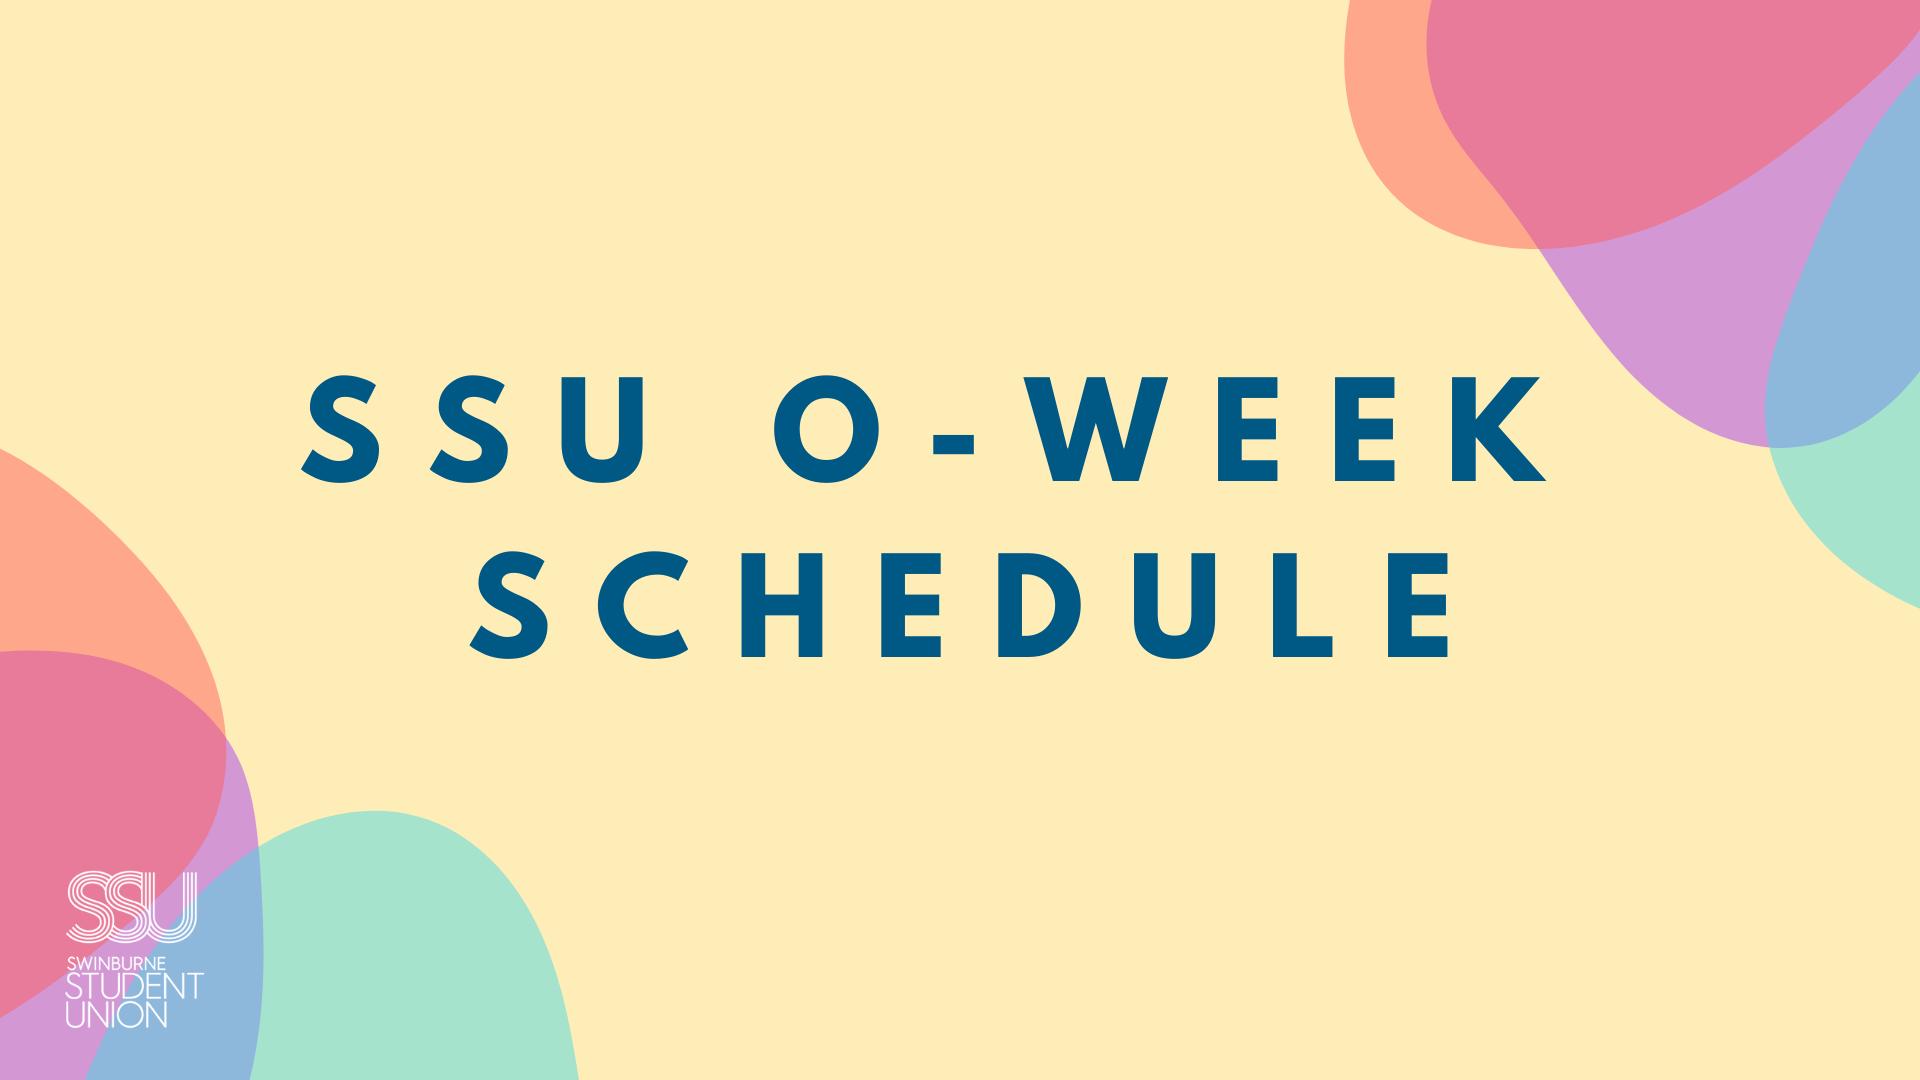 SSU Semester 2 O-Week Schedule